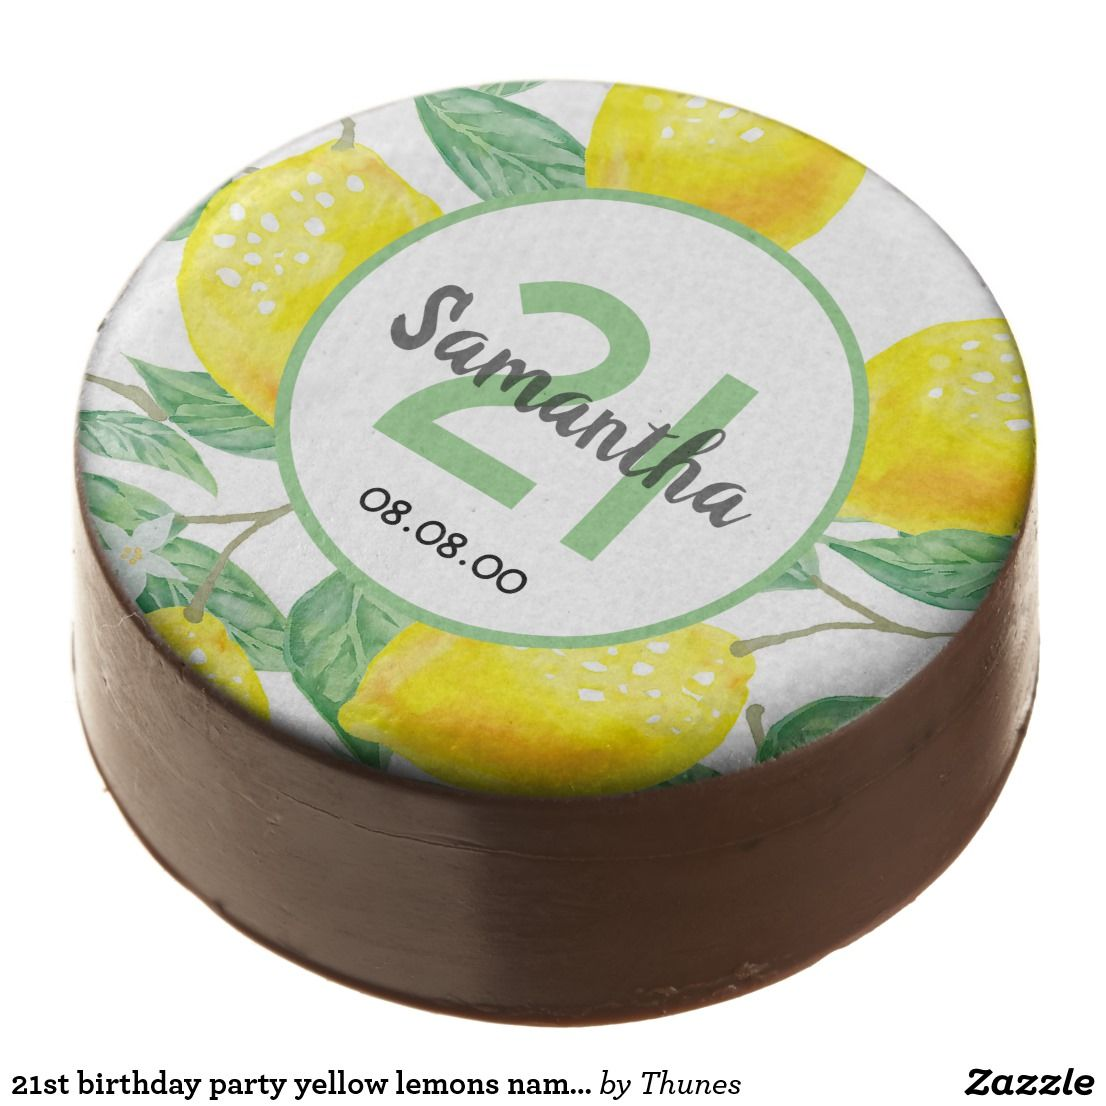 21st birthday party yellow lemons name age chocola